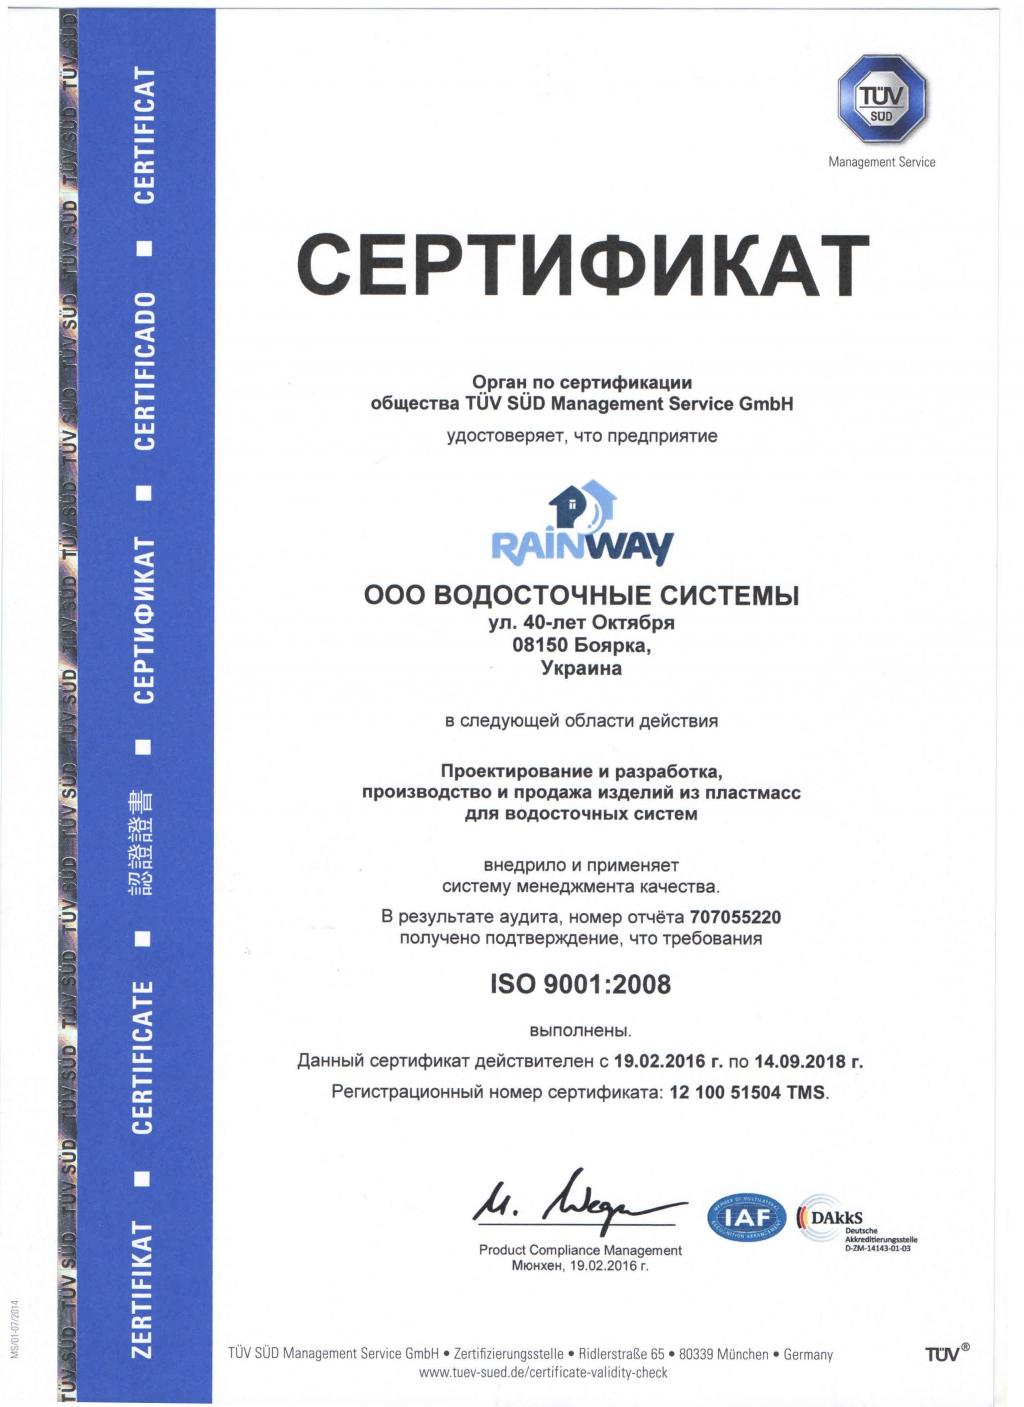 Rainway - Сертификат ISO9001